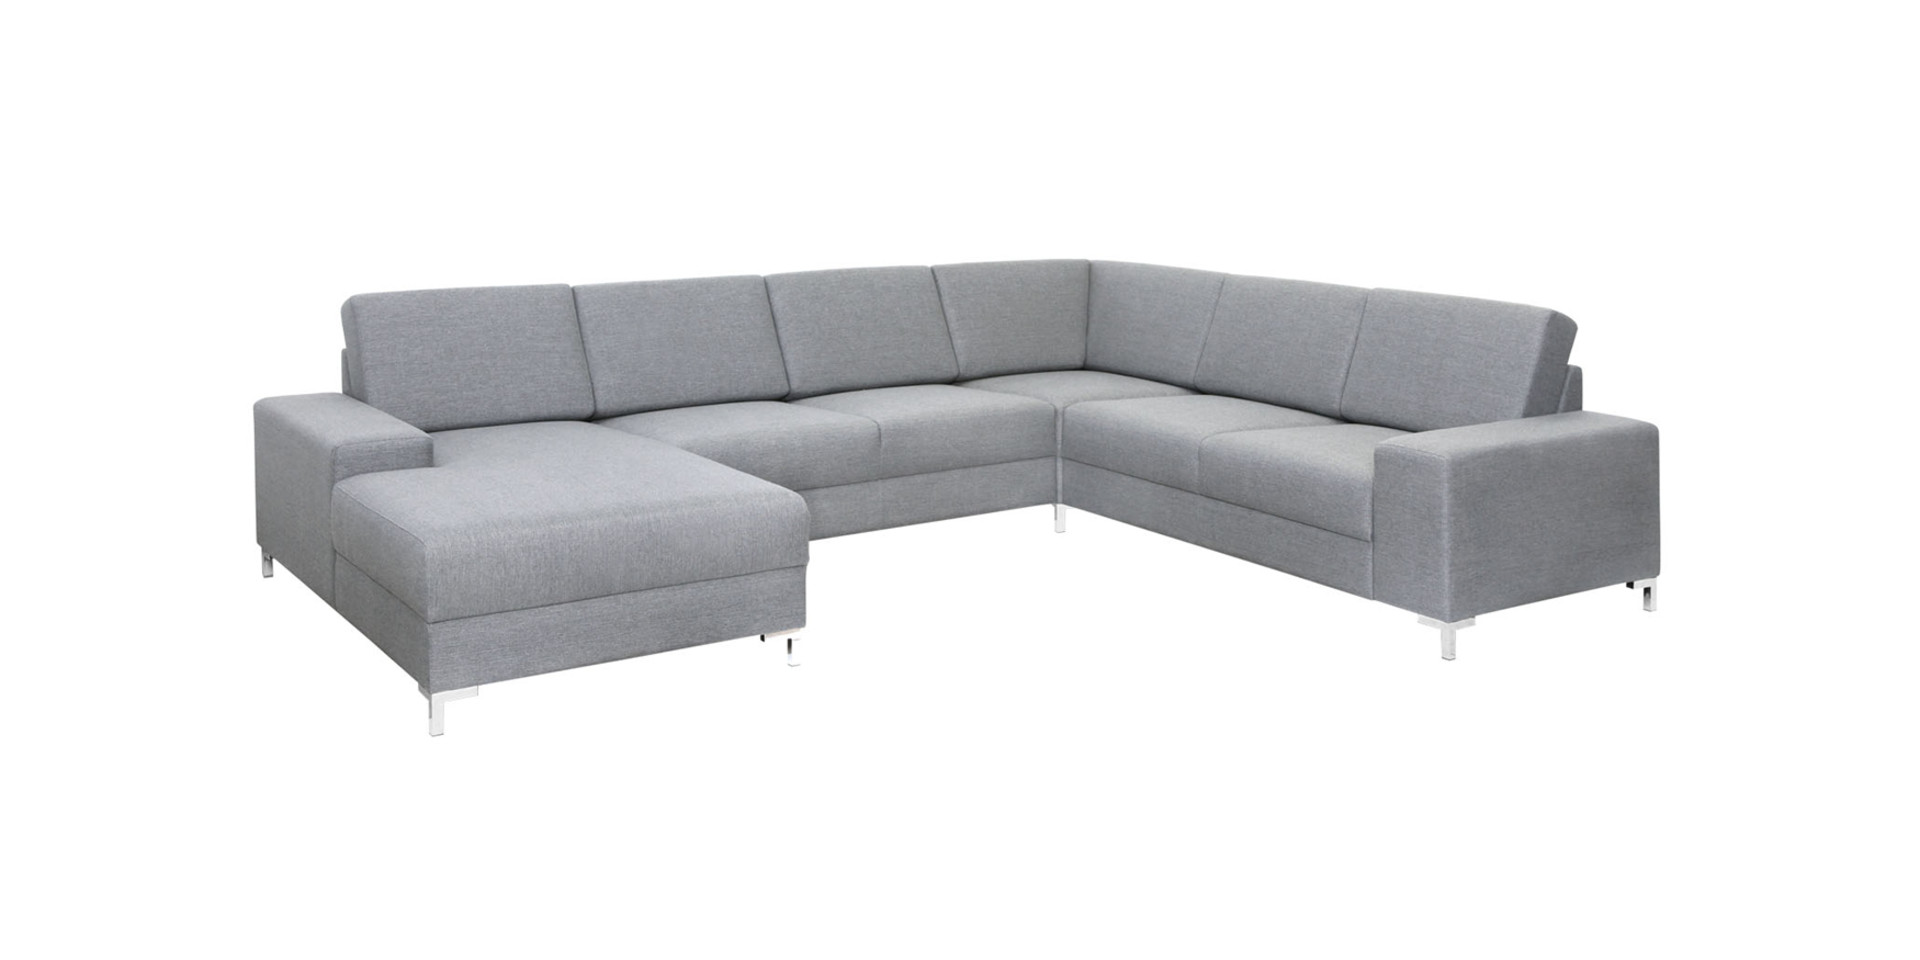 sits-anton-angle-set1_cavani18719_light_grey_2